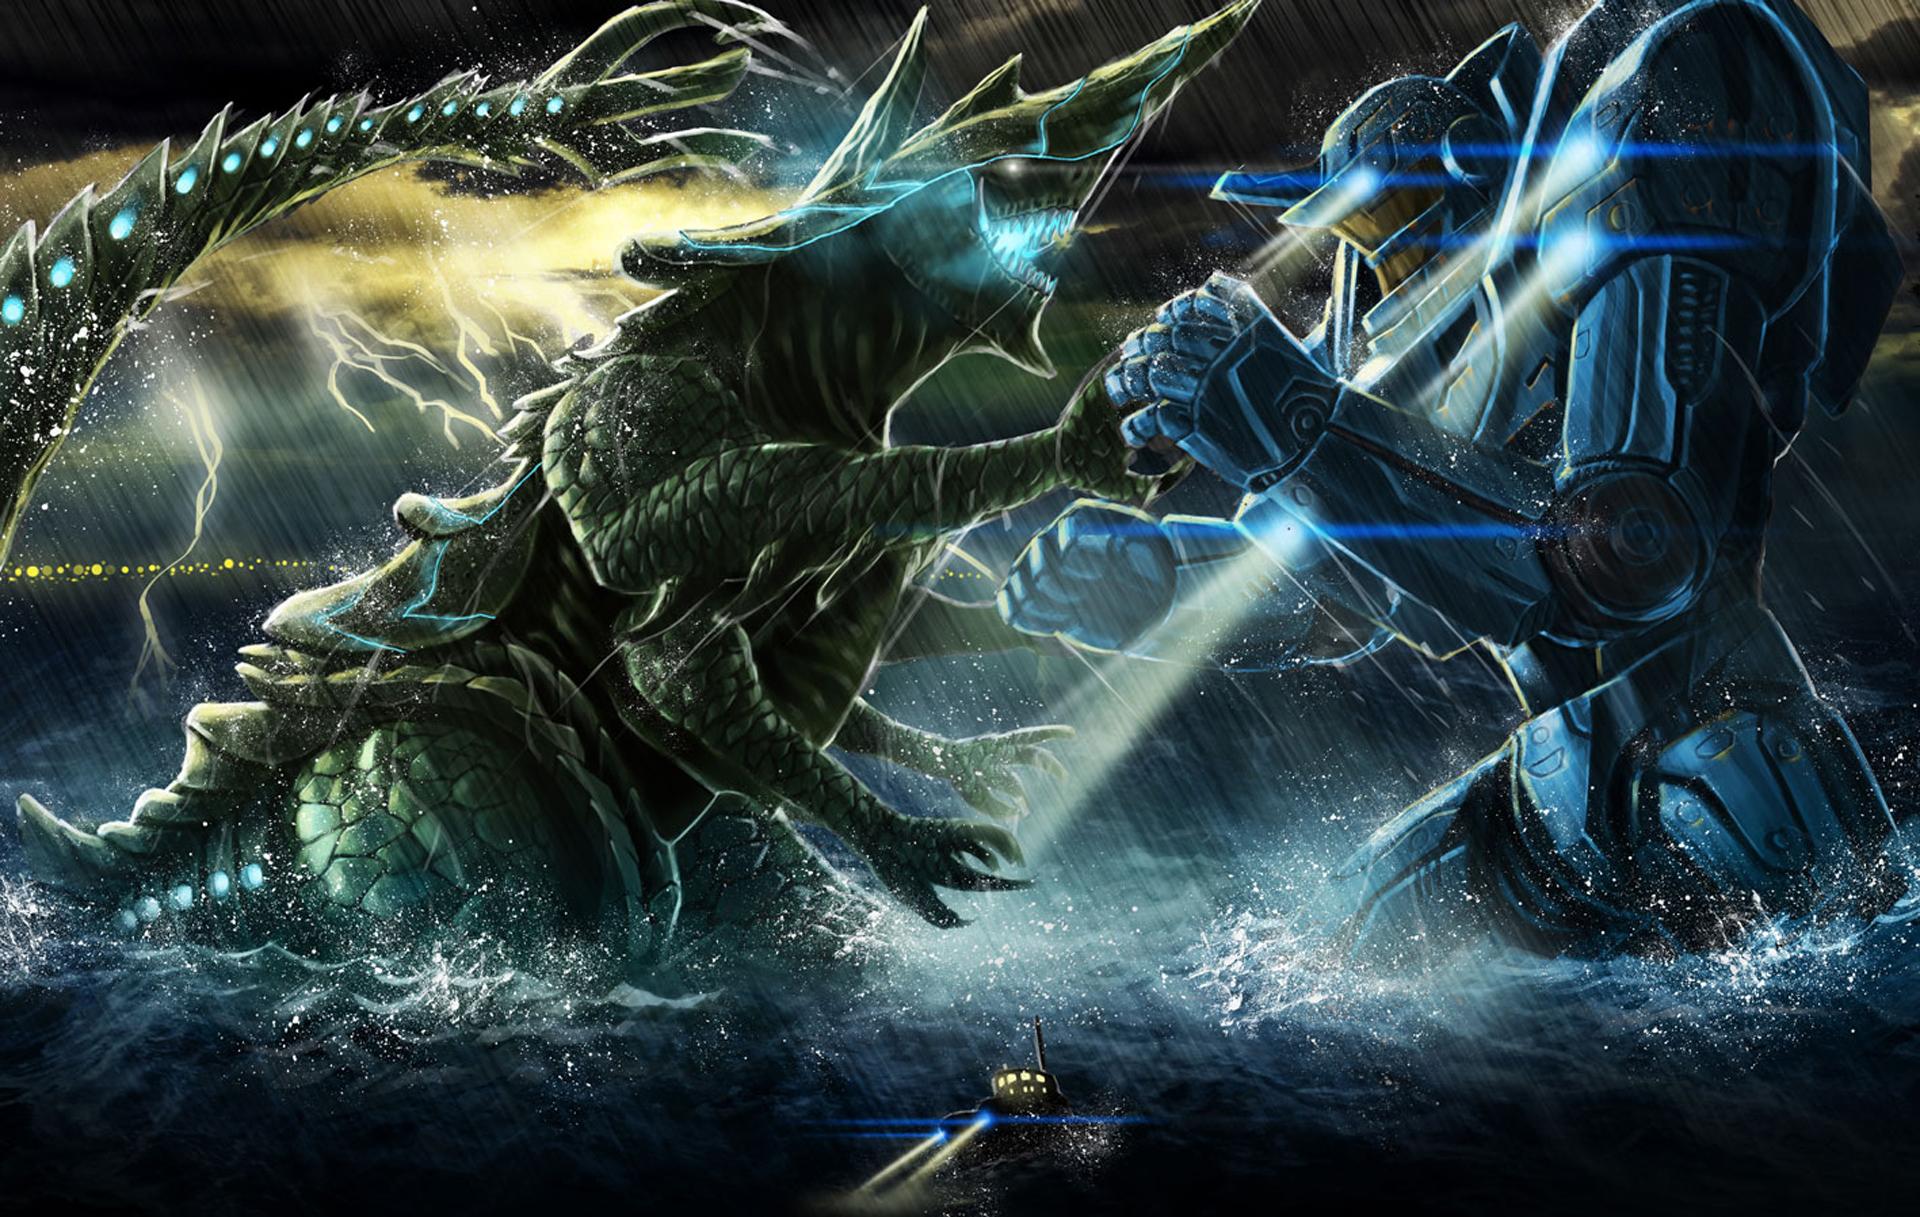 pacific rim movie jaeger vs kaiju b47 hd wallpaper